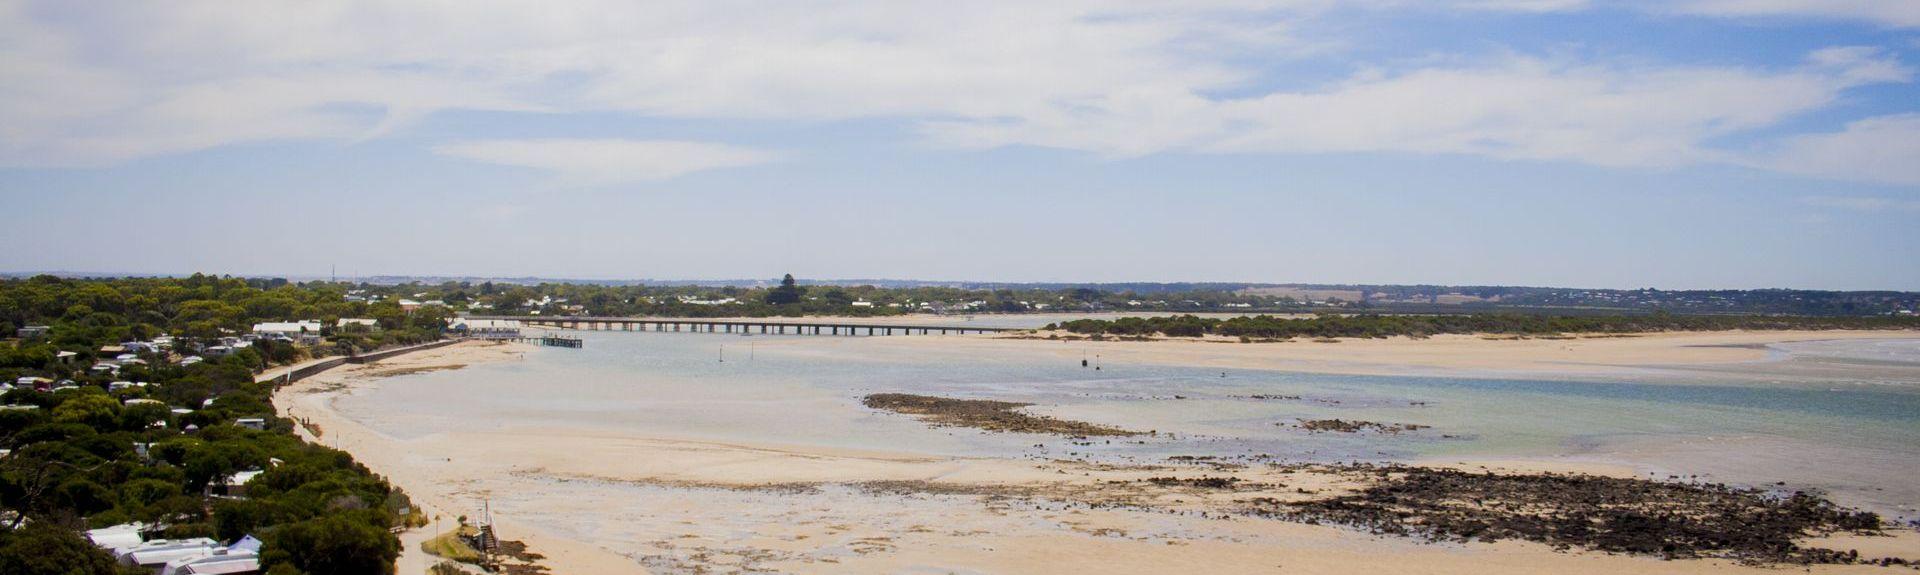 Belmont, VIC, Australia